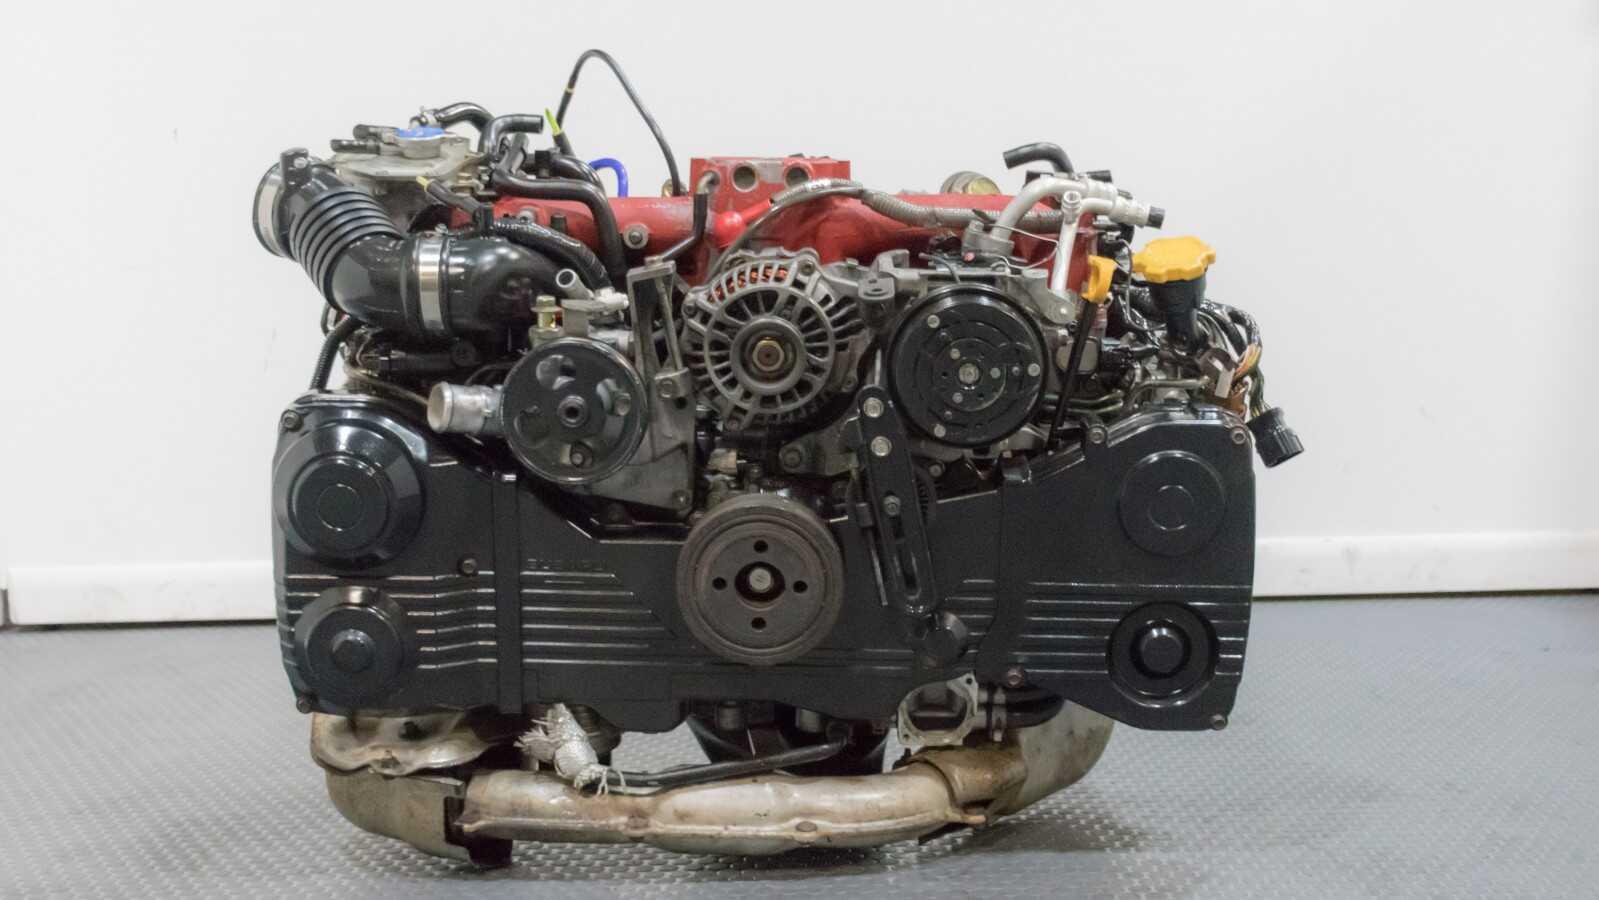 Wiring Harness Clips Used Jdm Subaru Forester Sti Ej255 2 5l 04 07 Motor Swap